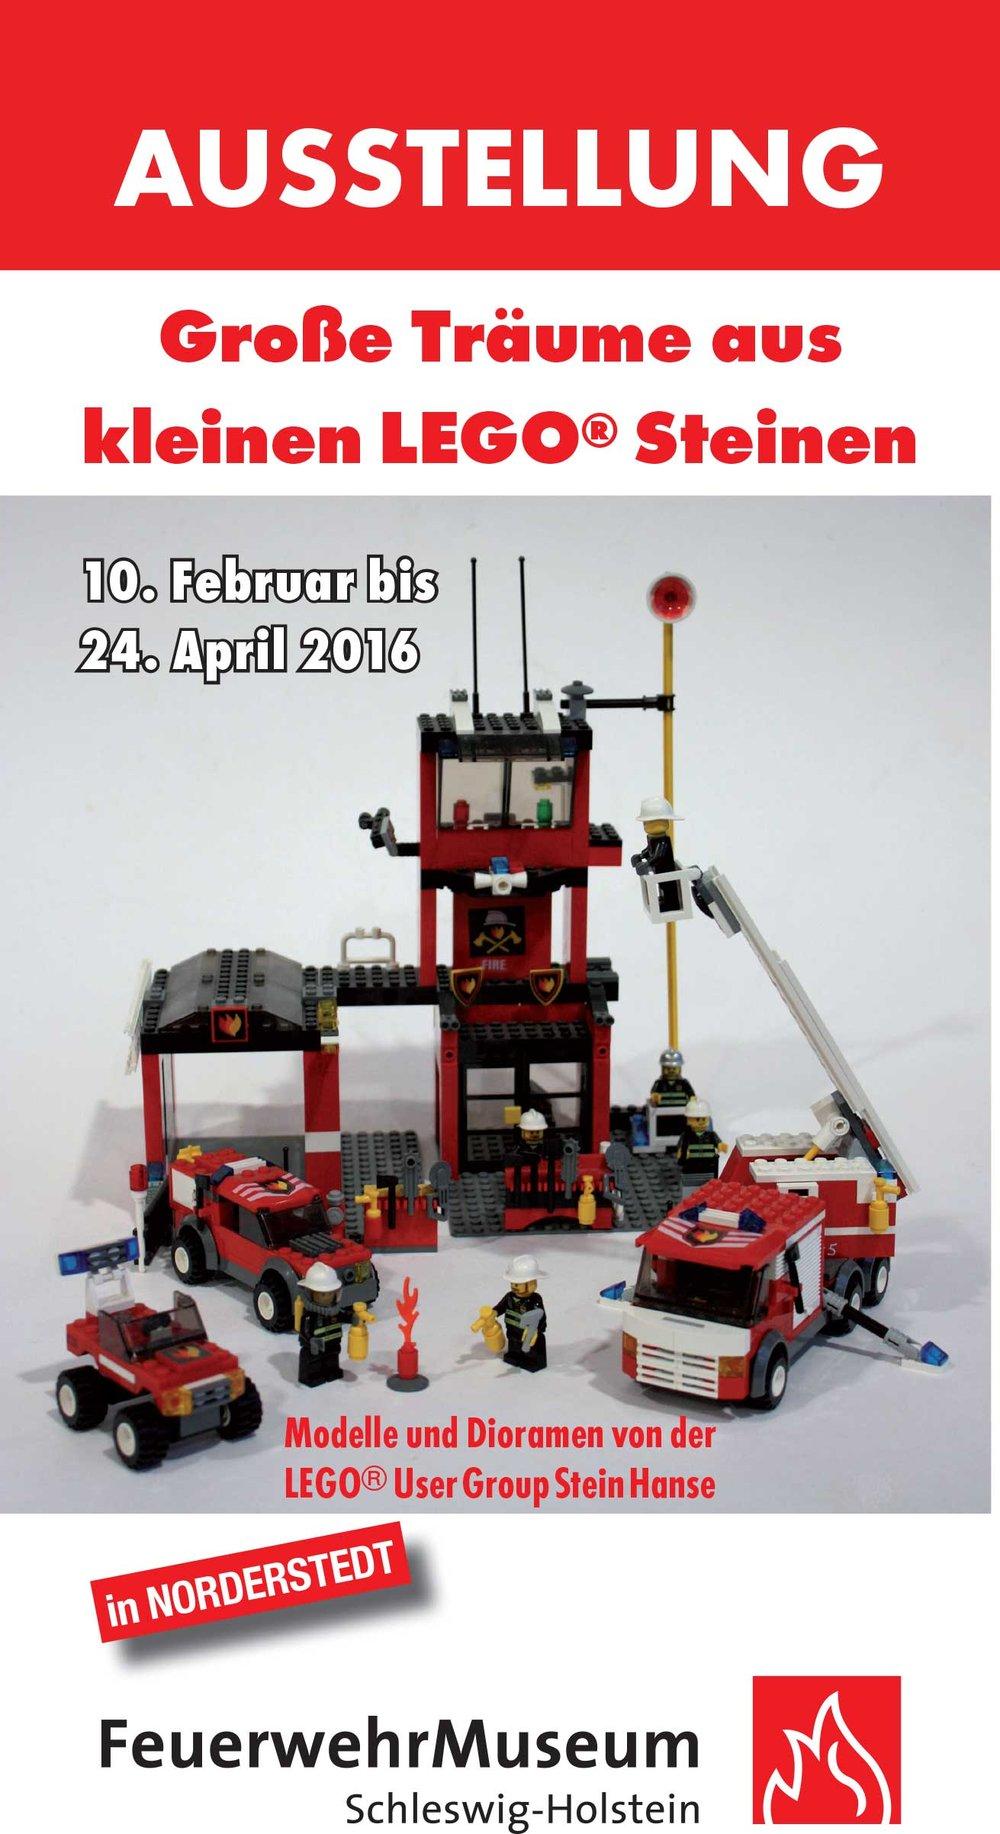 LEGO---Flyer-1.jpg